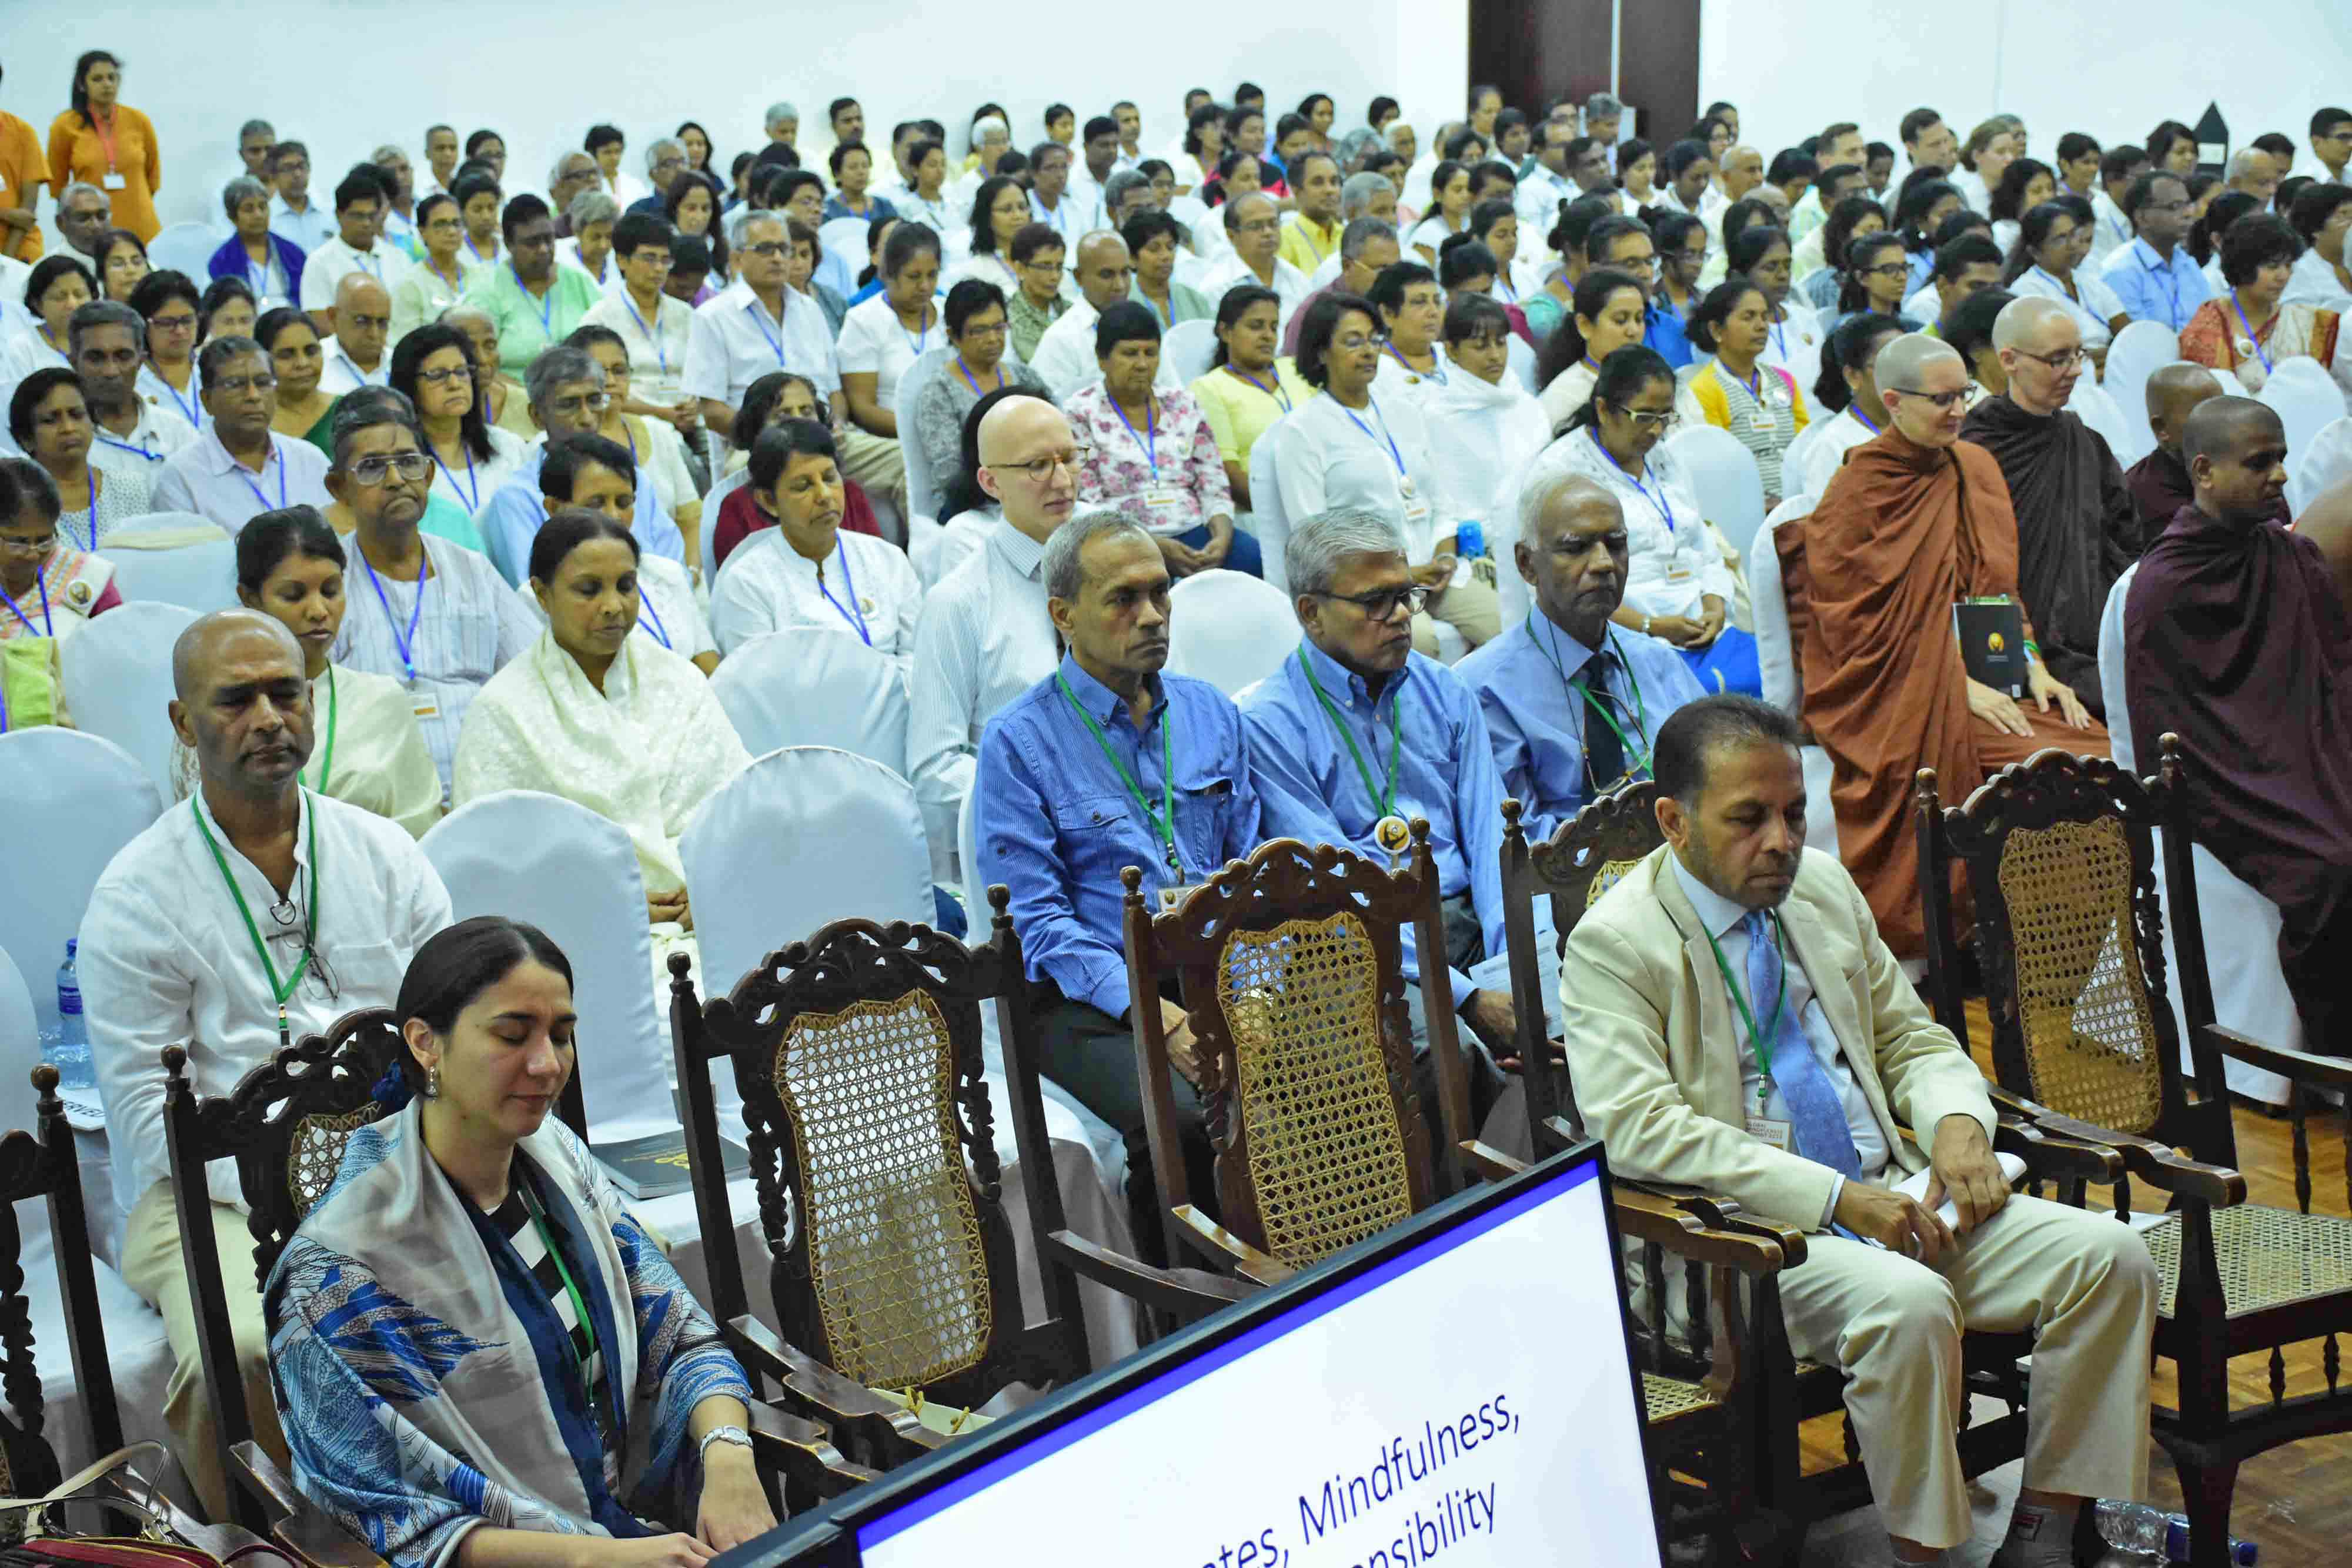 Global Mindfulness Summit 2018 - Day2 (64)